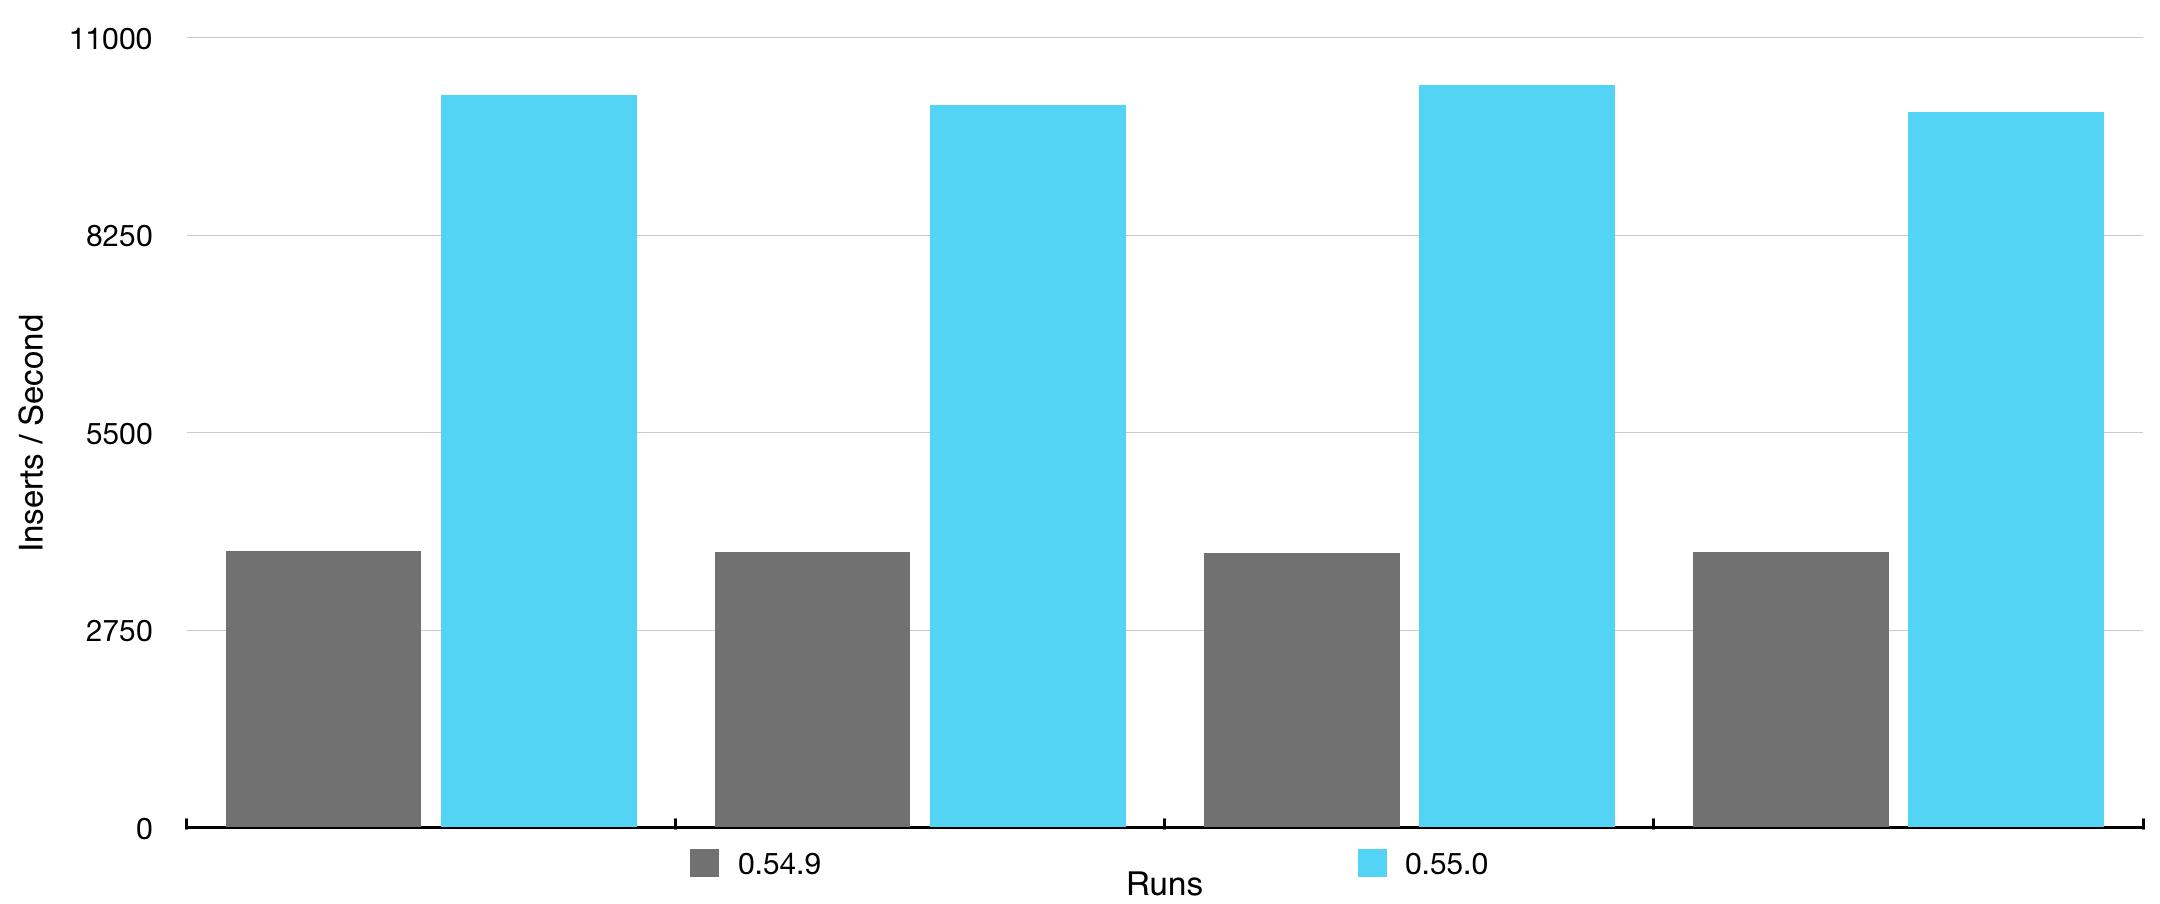 Bulk inserts boost on replicated data